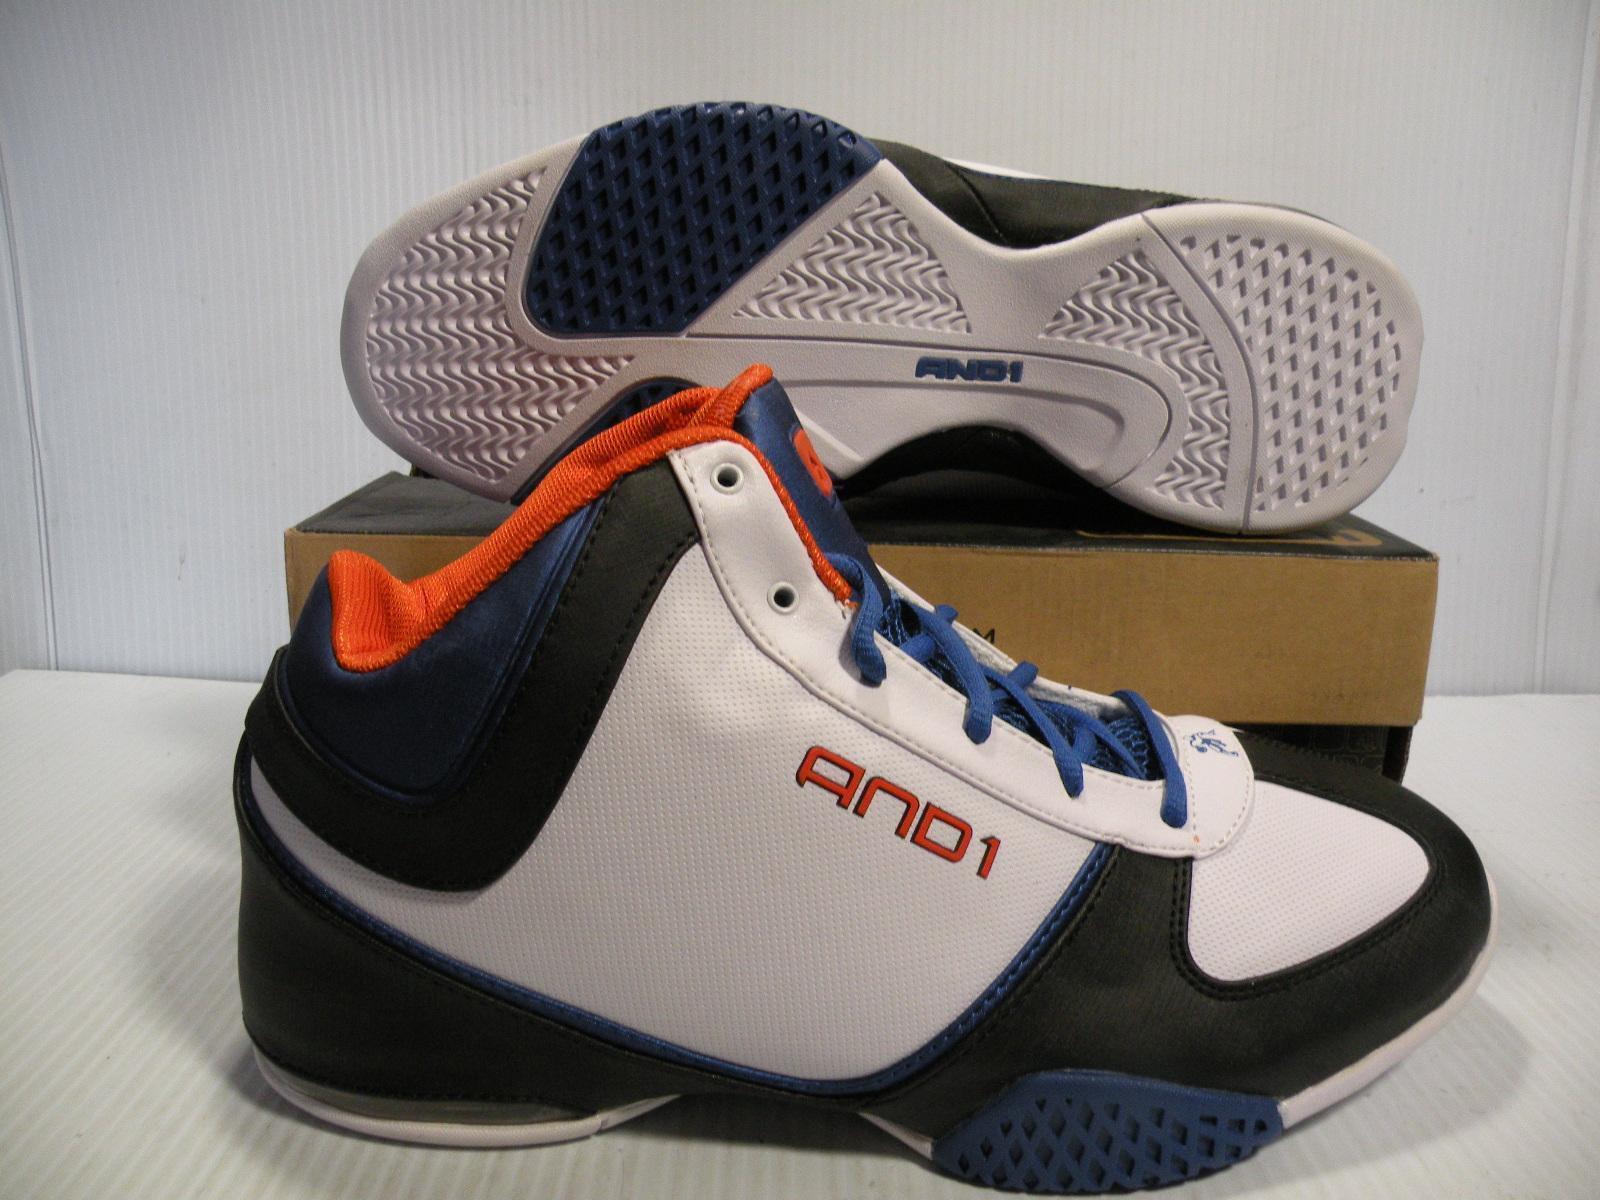 AND1 MUCHO Schuhe GUSTO MID BASKETBALL MEN Schuhe MUCHO Weiß/BLACK/Blau 321674 SIZE 8 NEW aa17ef